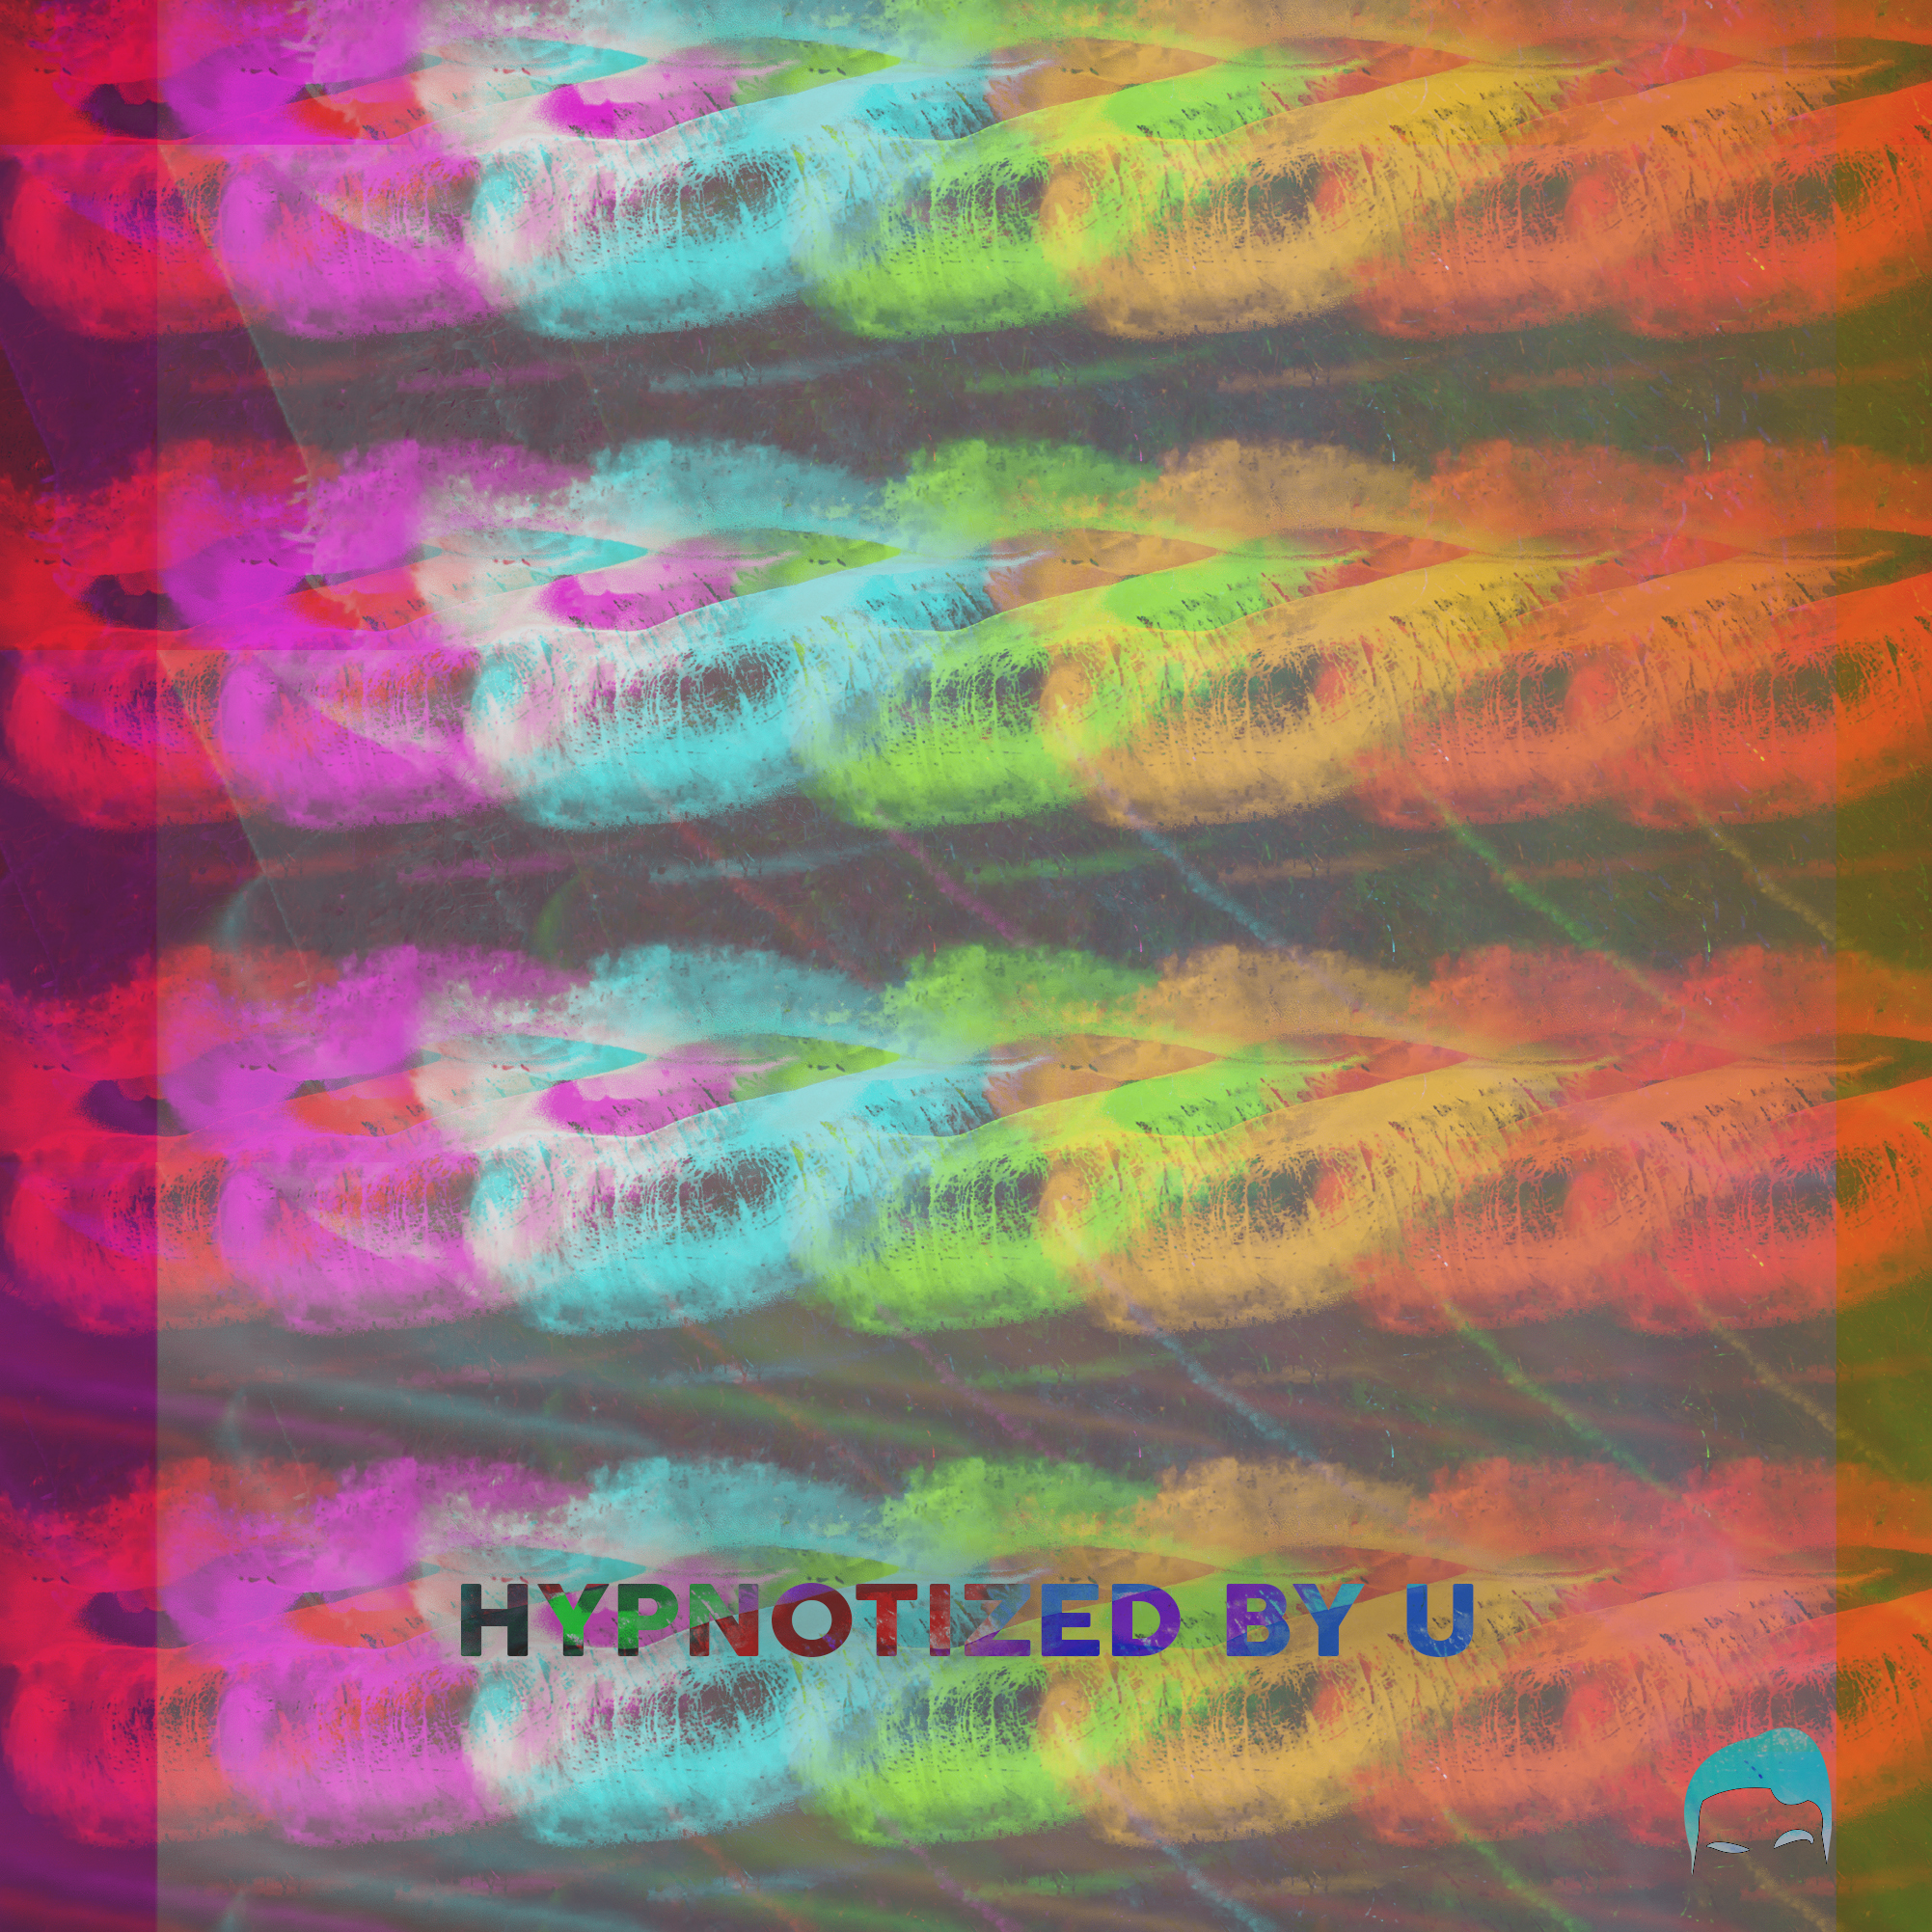 HYPNOTIZED BY U - LISTEN HERE